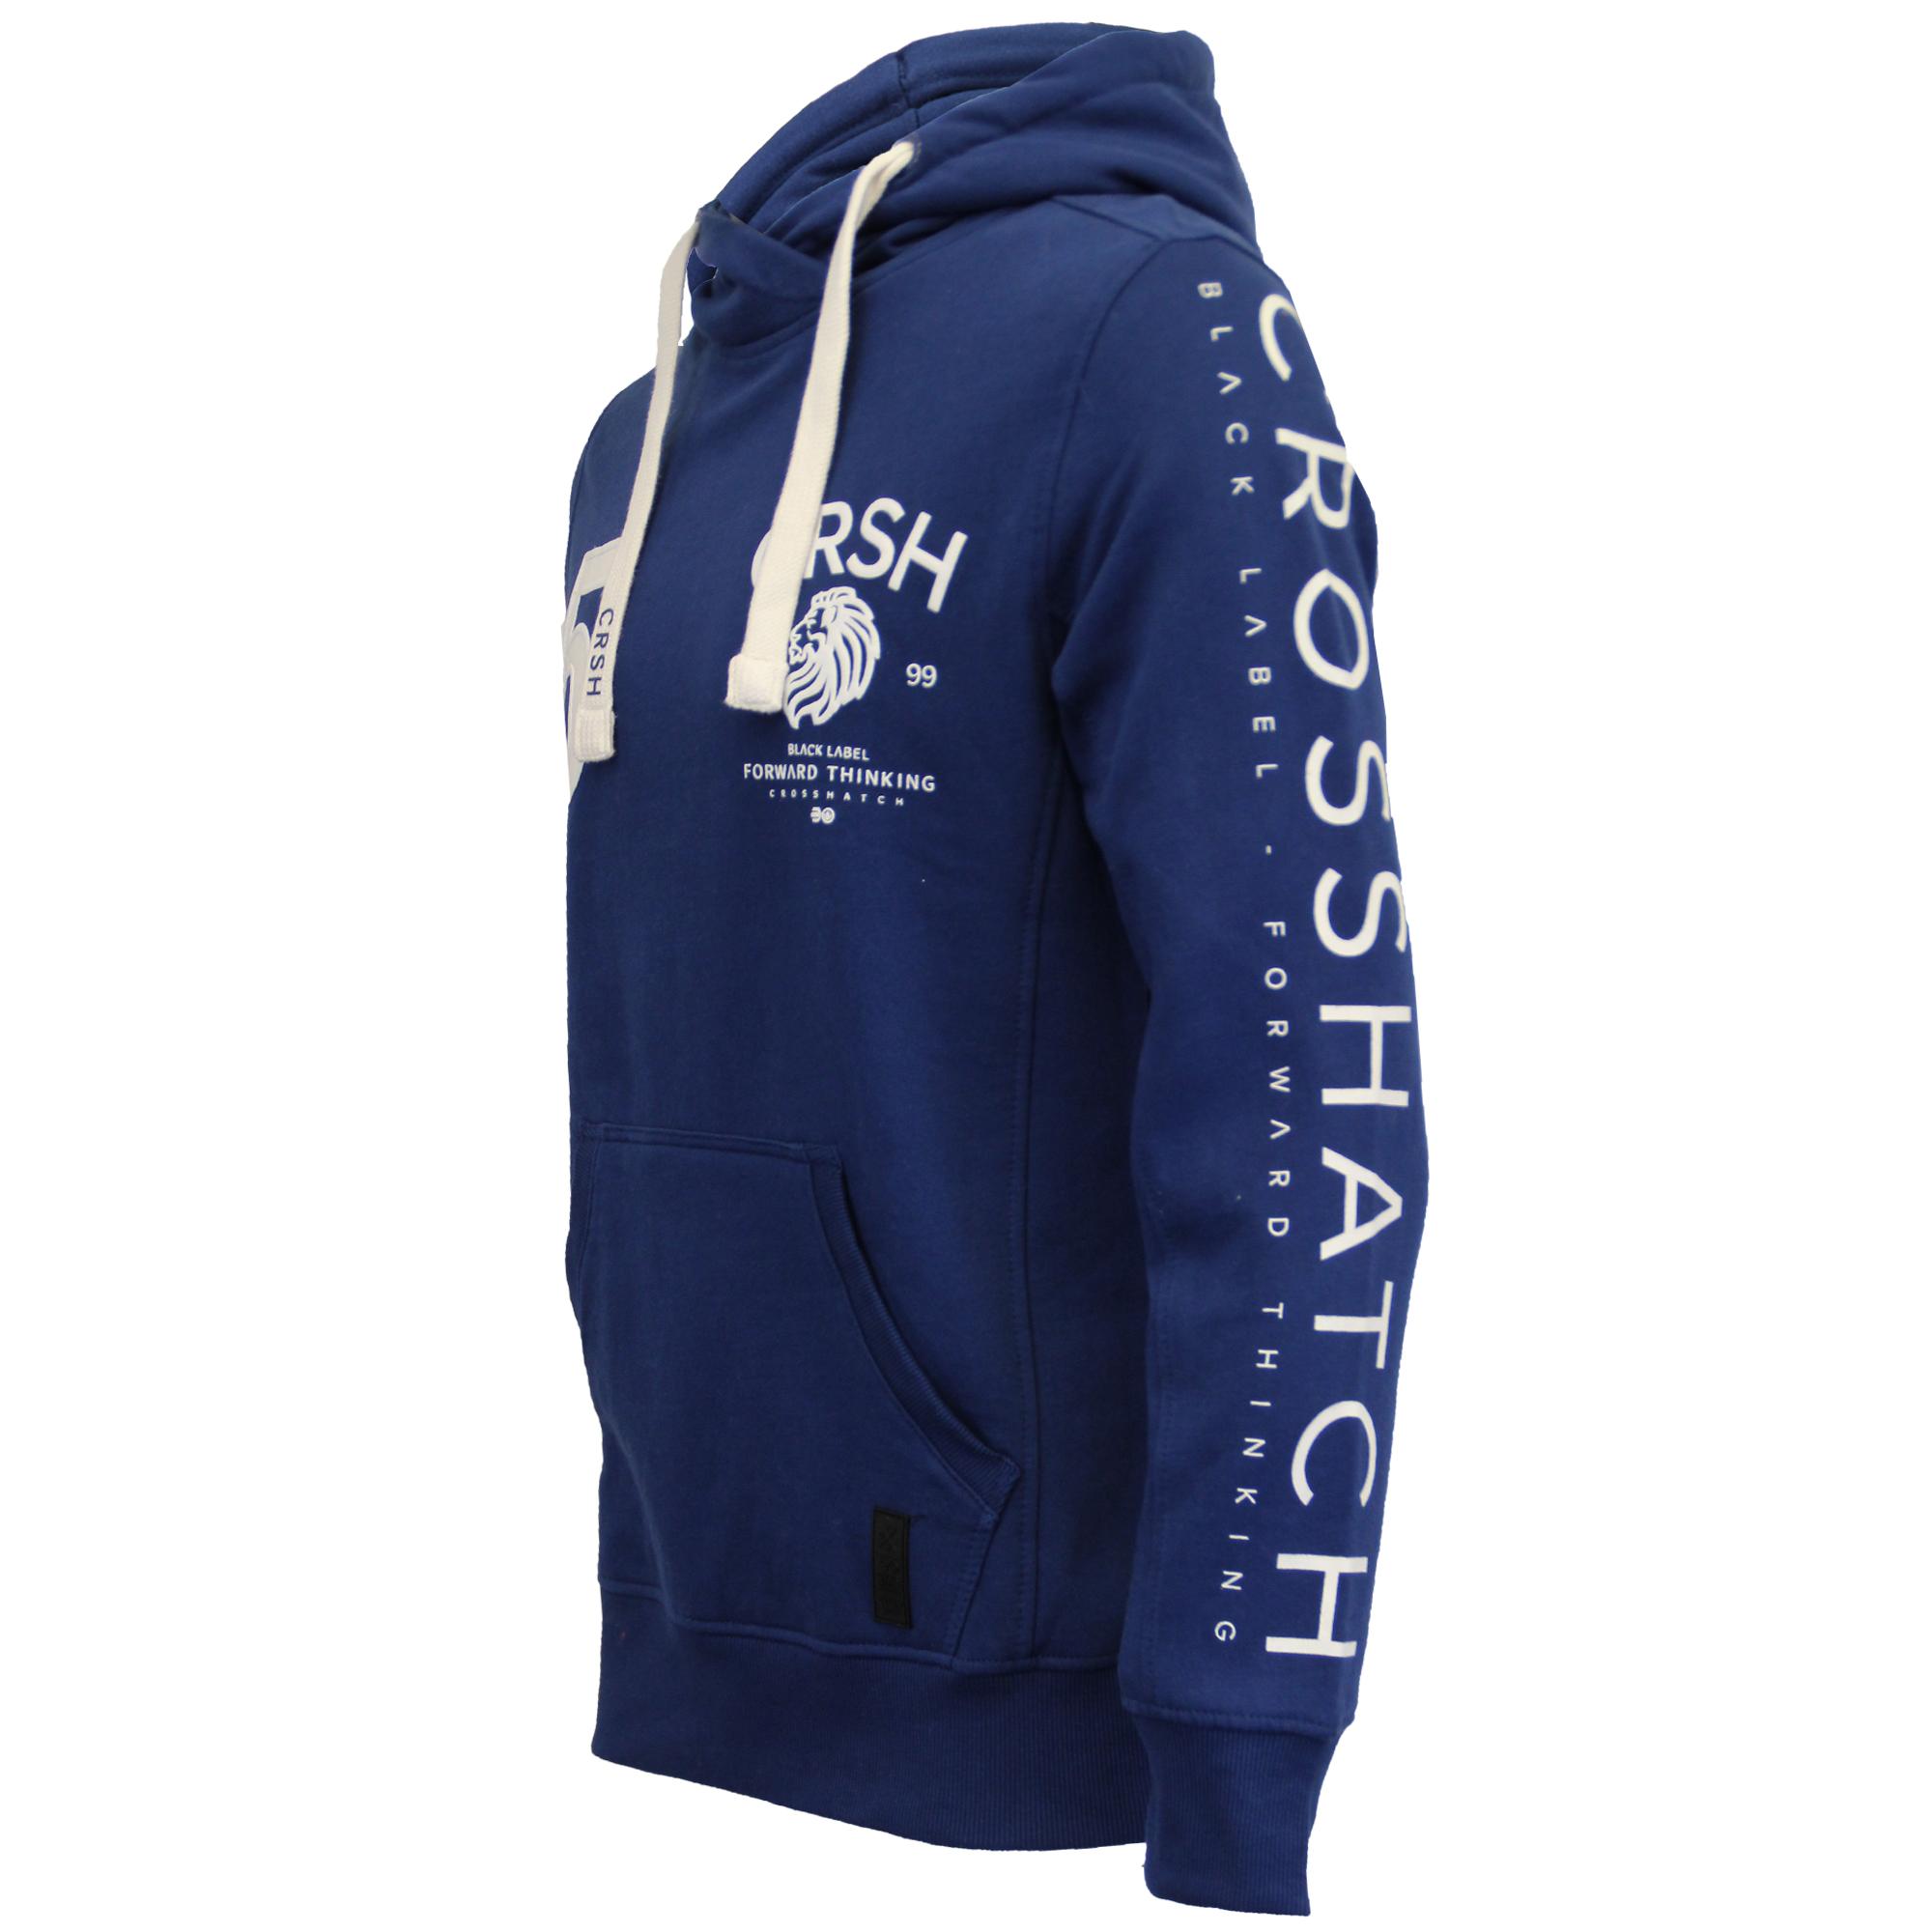 Mens-Sweatshirt-Crosshatch-Hoodie-Top-Embossed-Logo-Print-Sweat-Fleece-Lined-New thumbnail 9